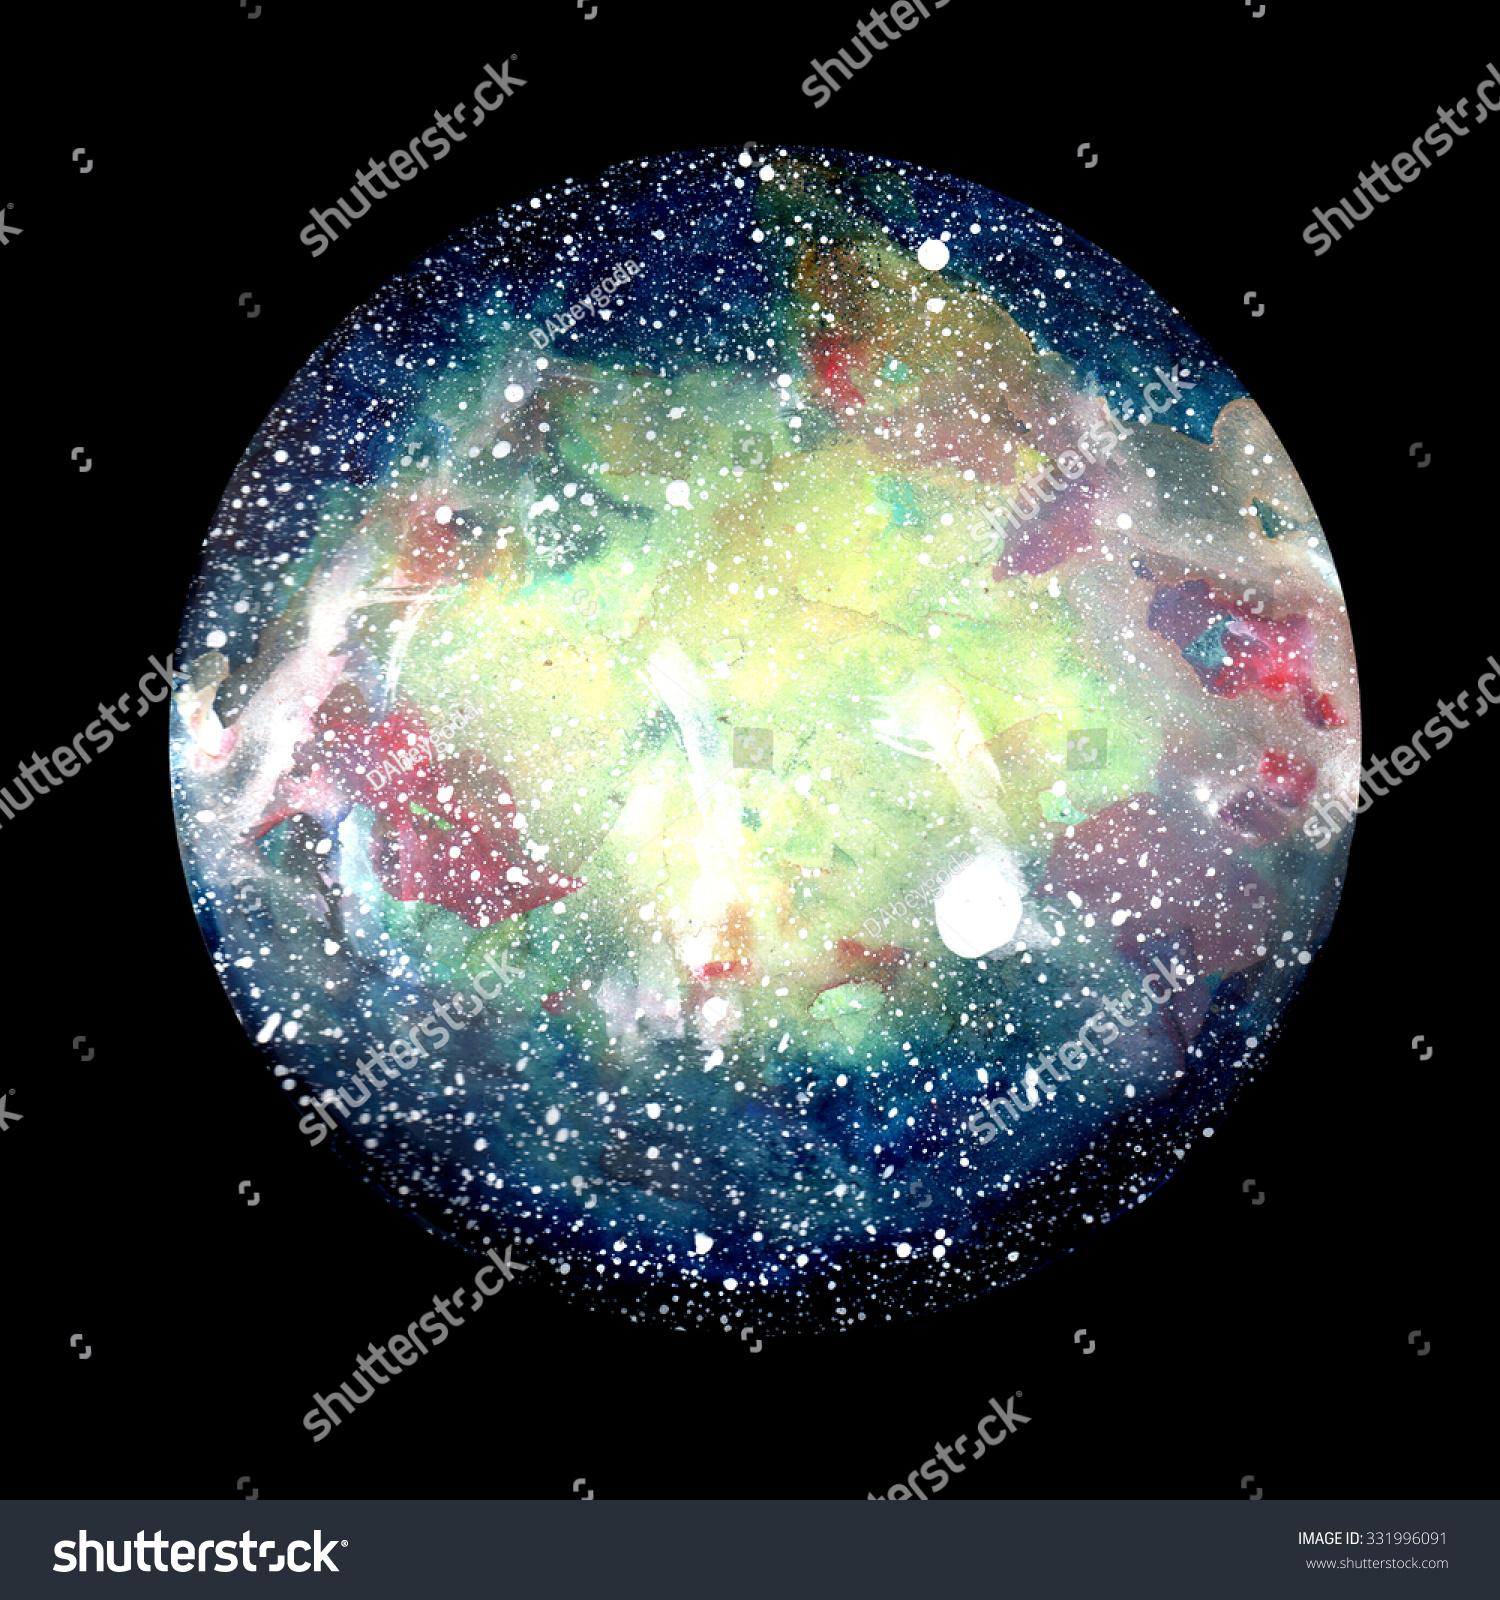 shutterstock cosmic art science - photo #6